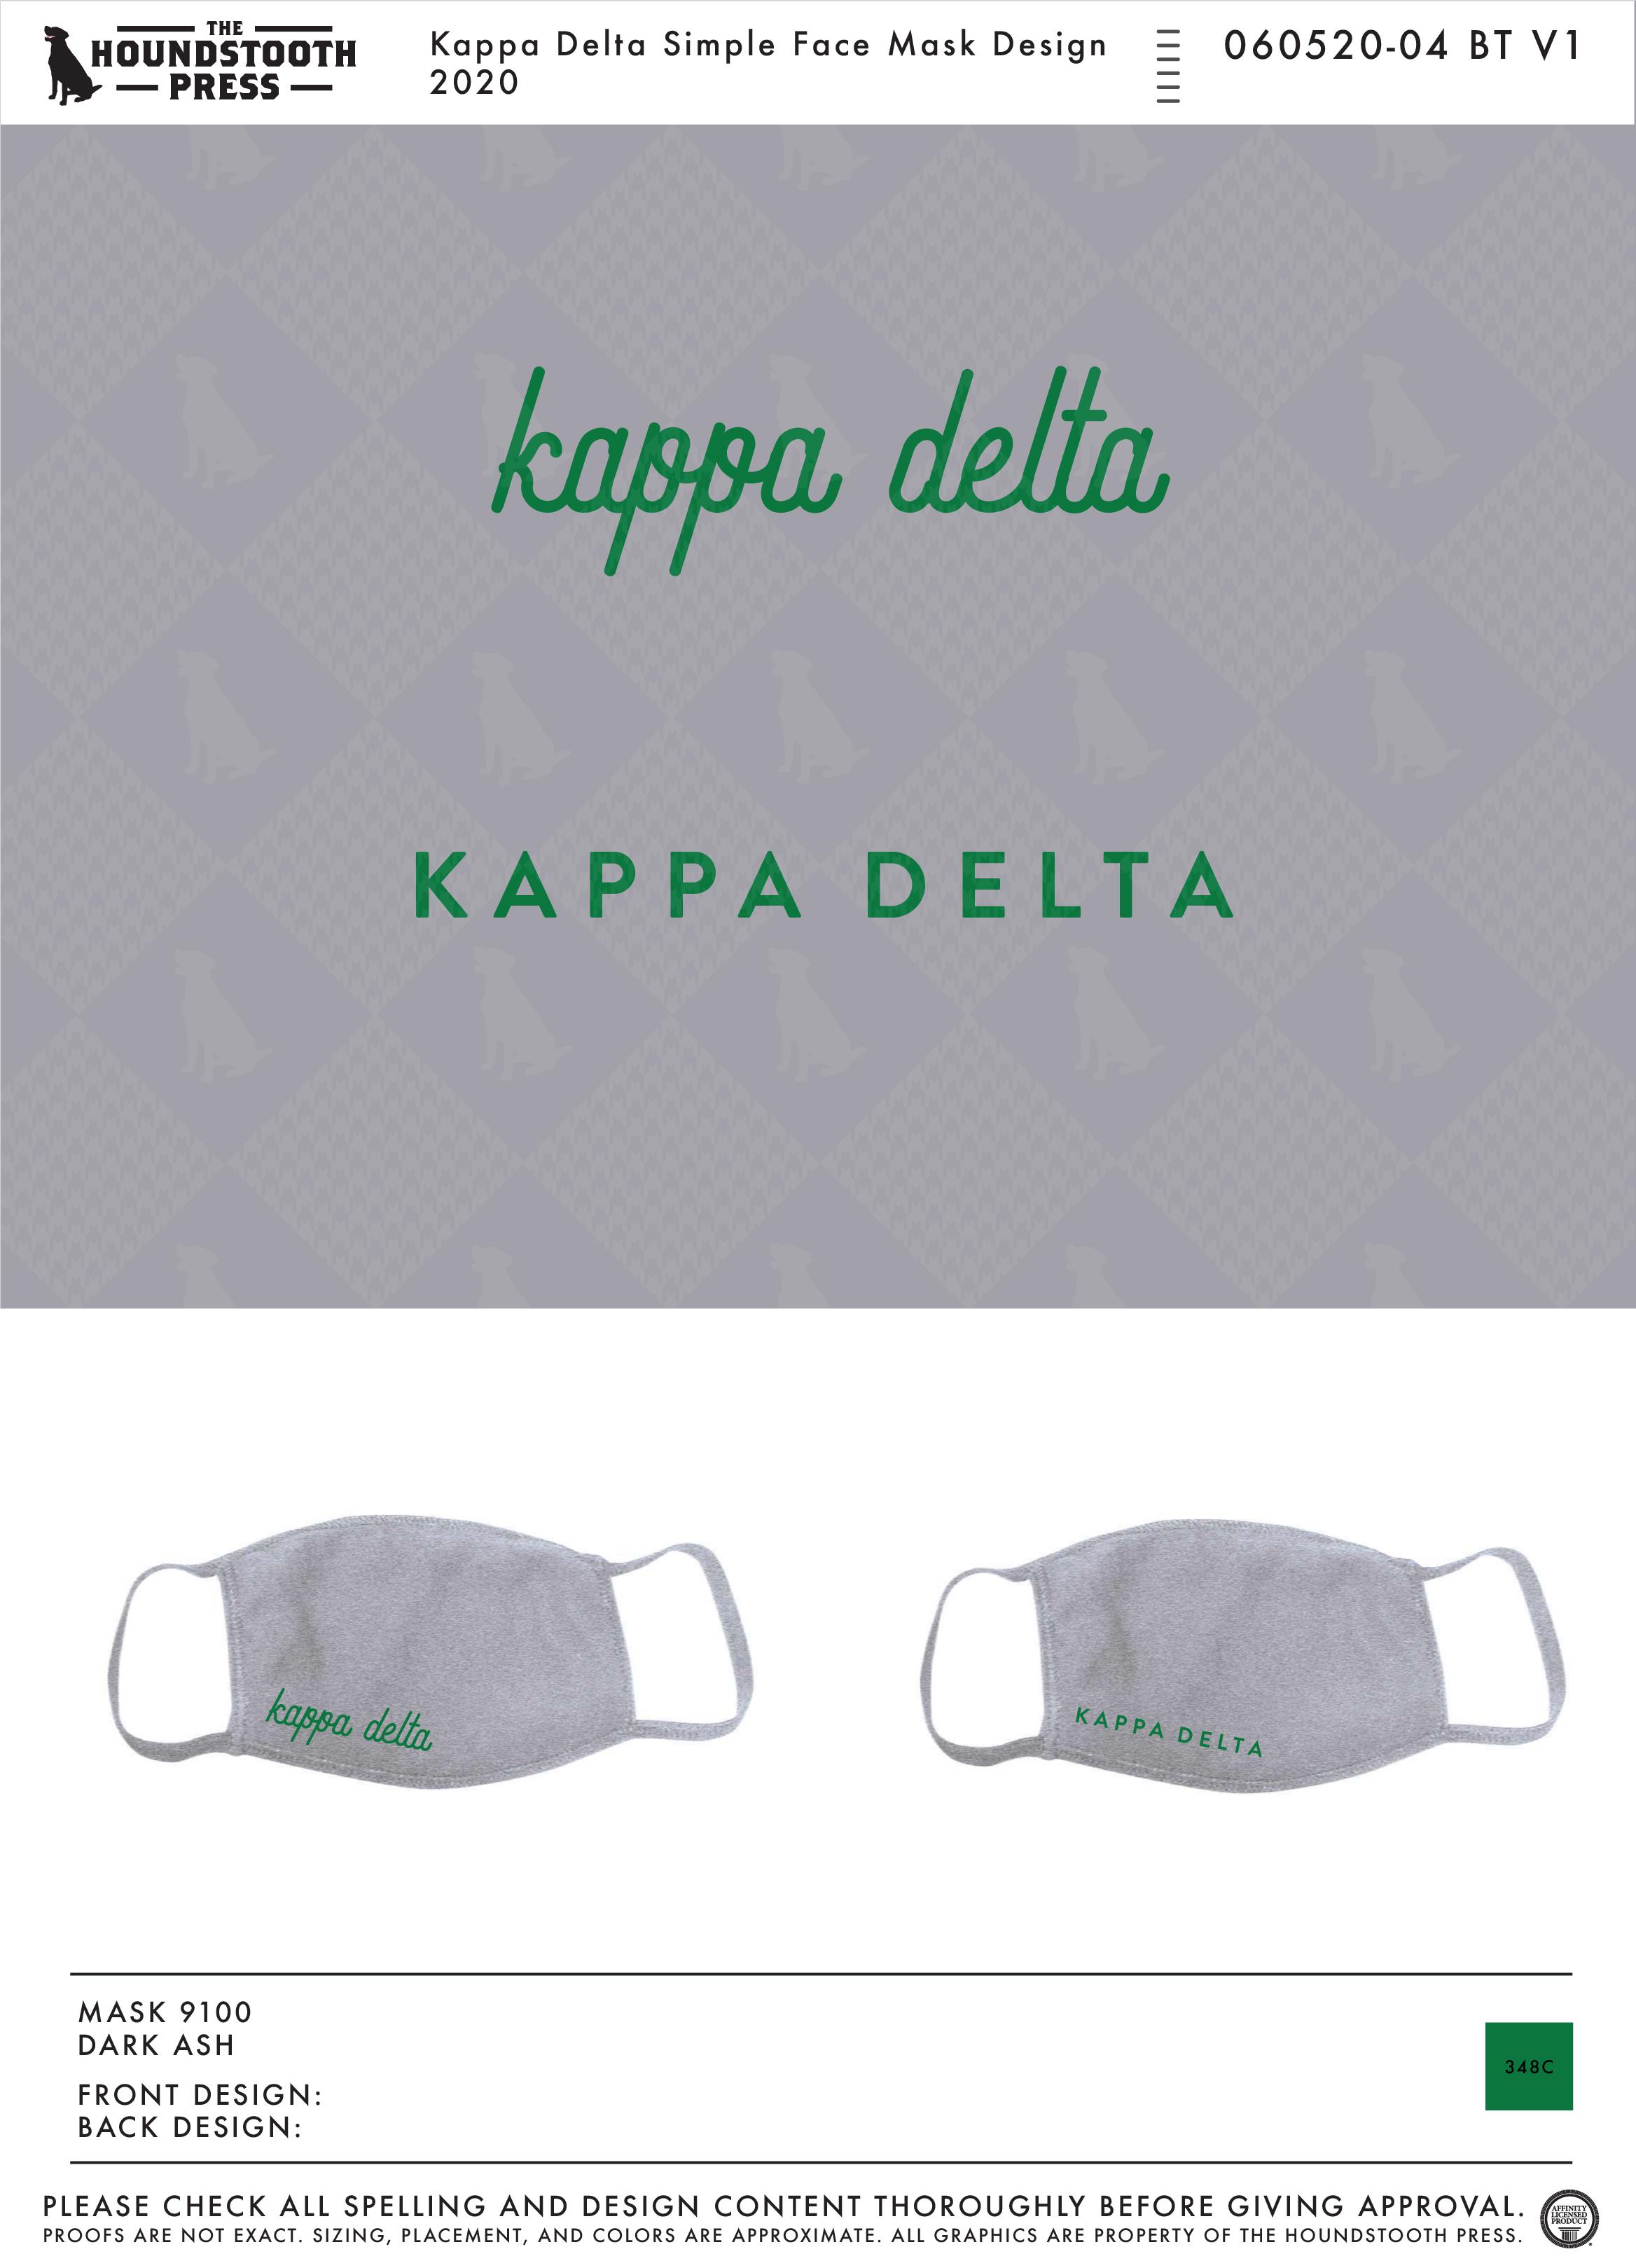 Custom Sorority Apparel More The Houndstooth Press Kappa Delta Face Mask Custom Design Shirts Sorority Outfits Sorority Shirts